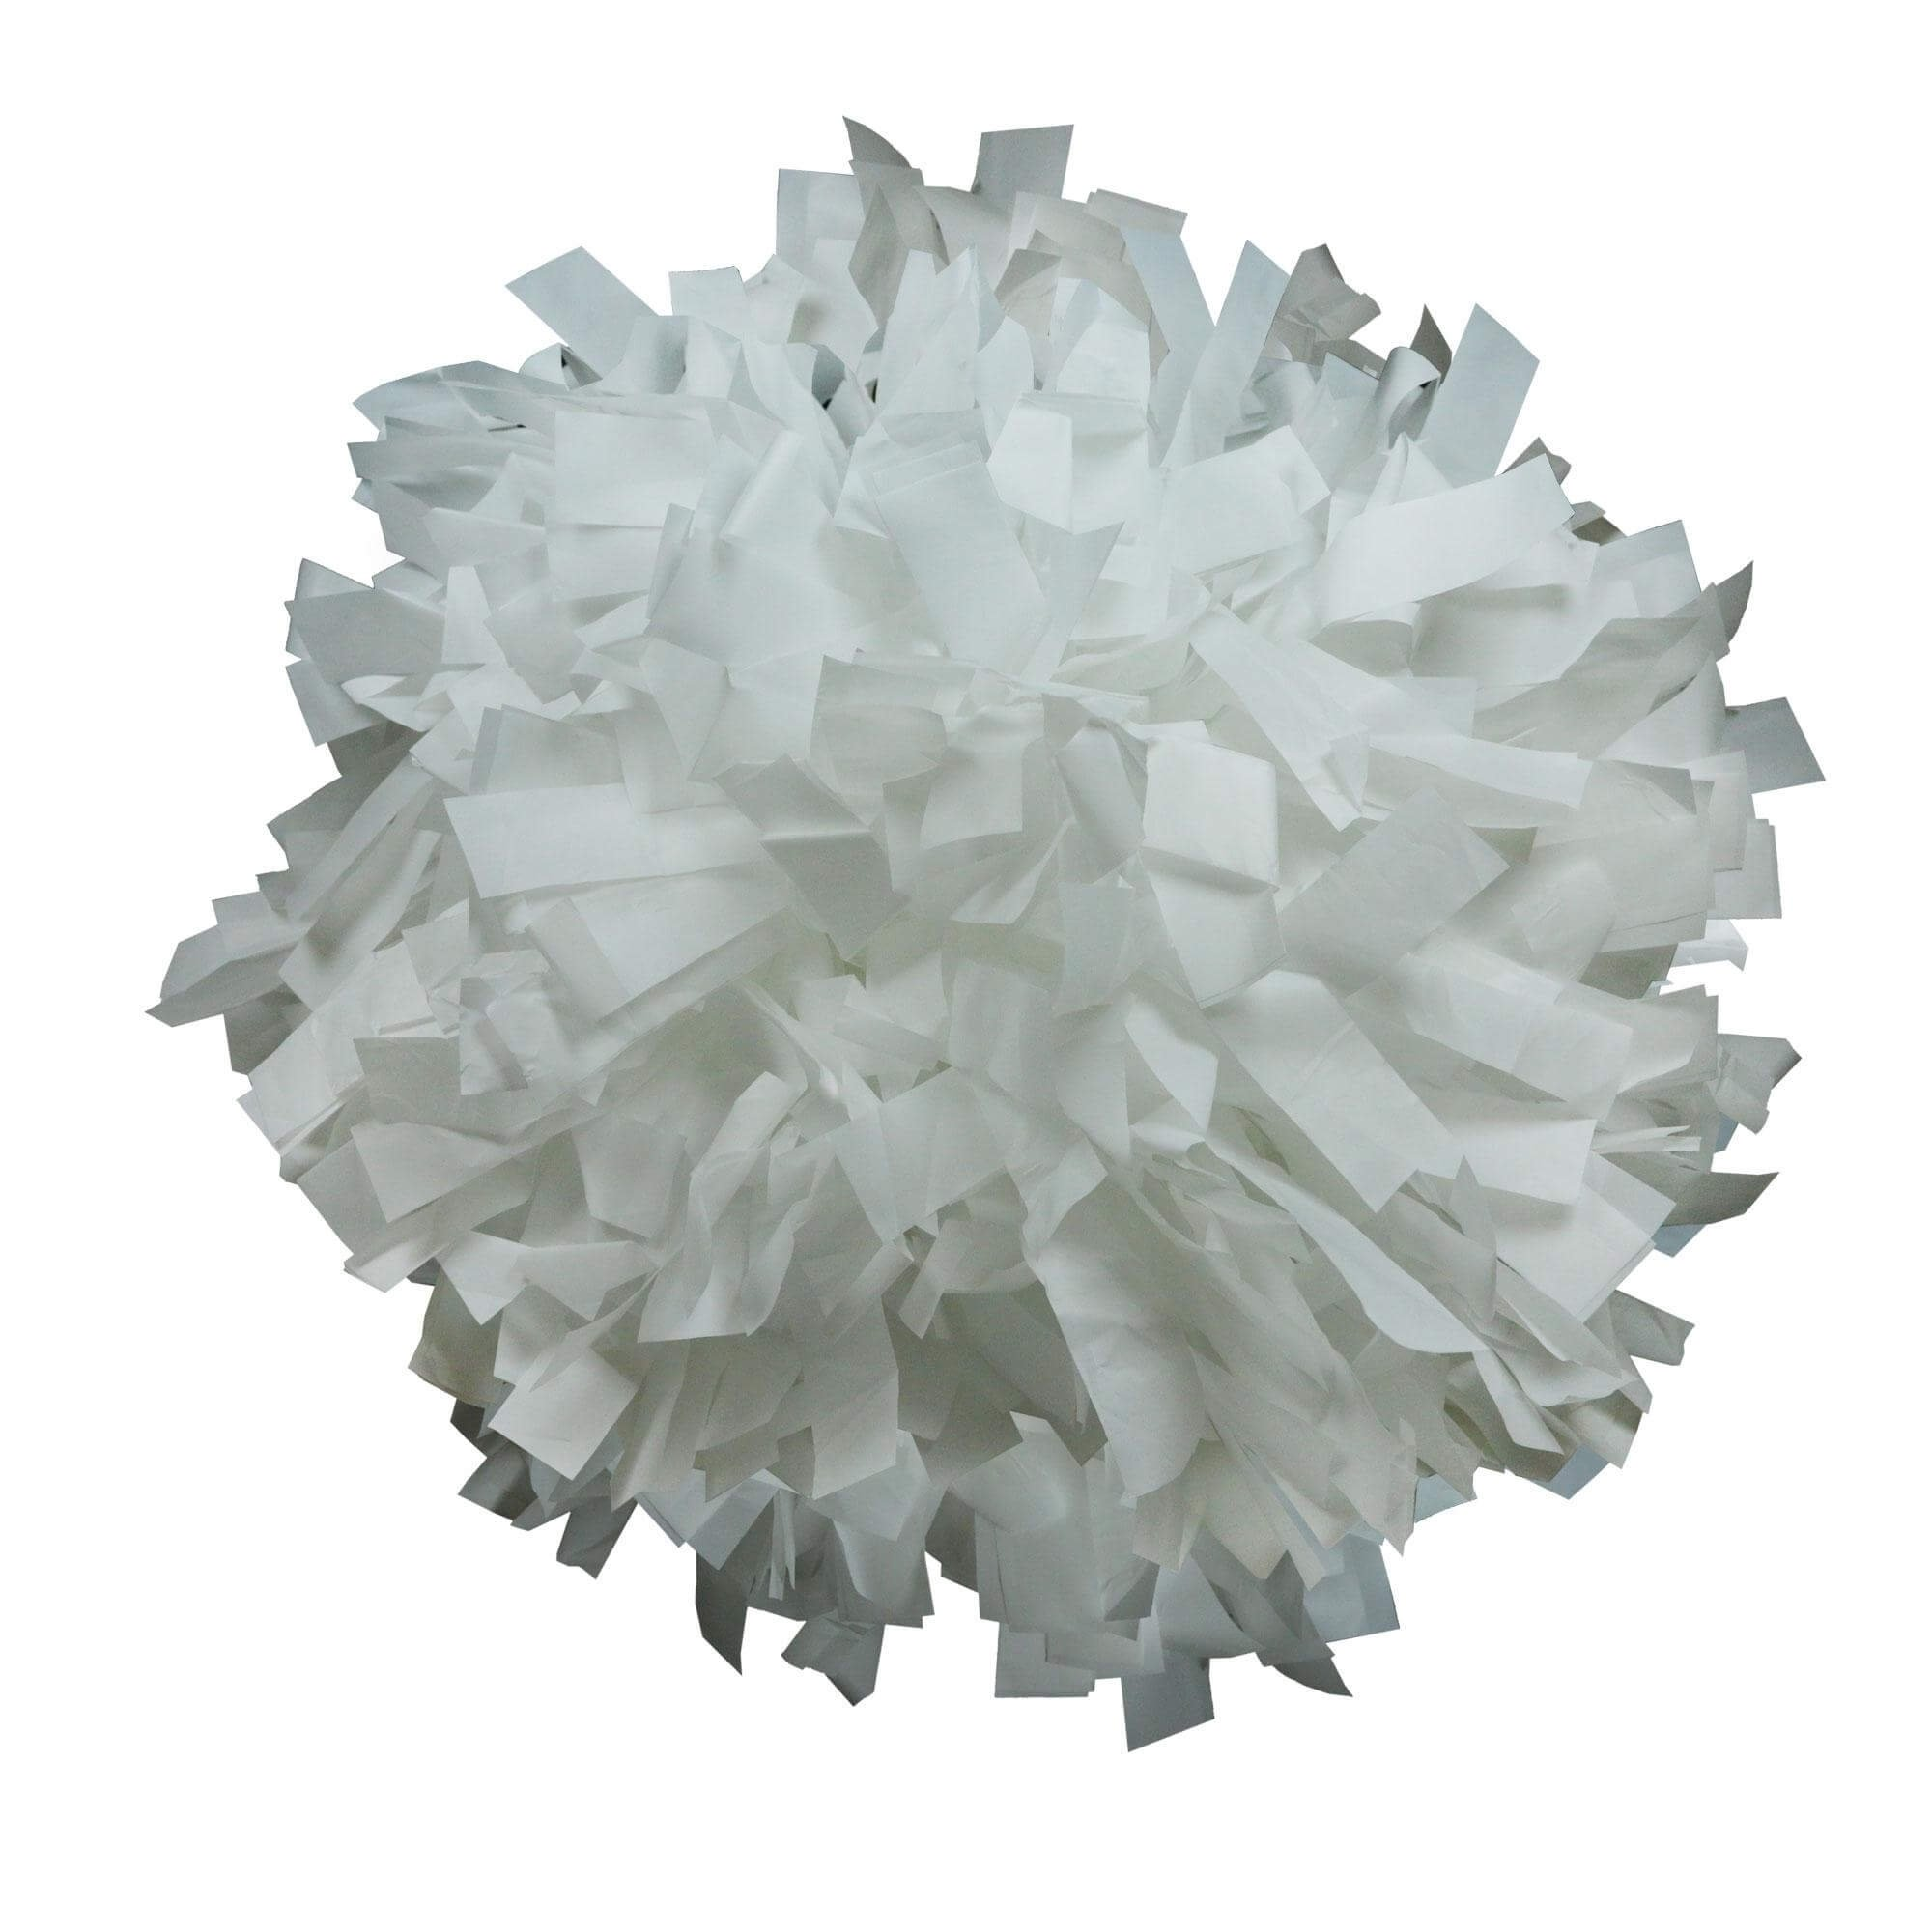 Danzcue White Plastic Poms - One Pair